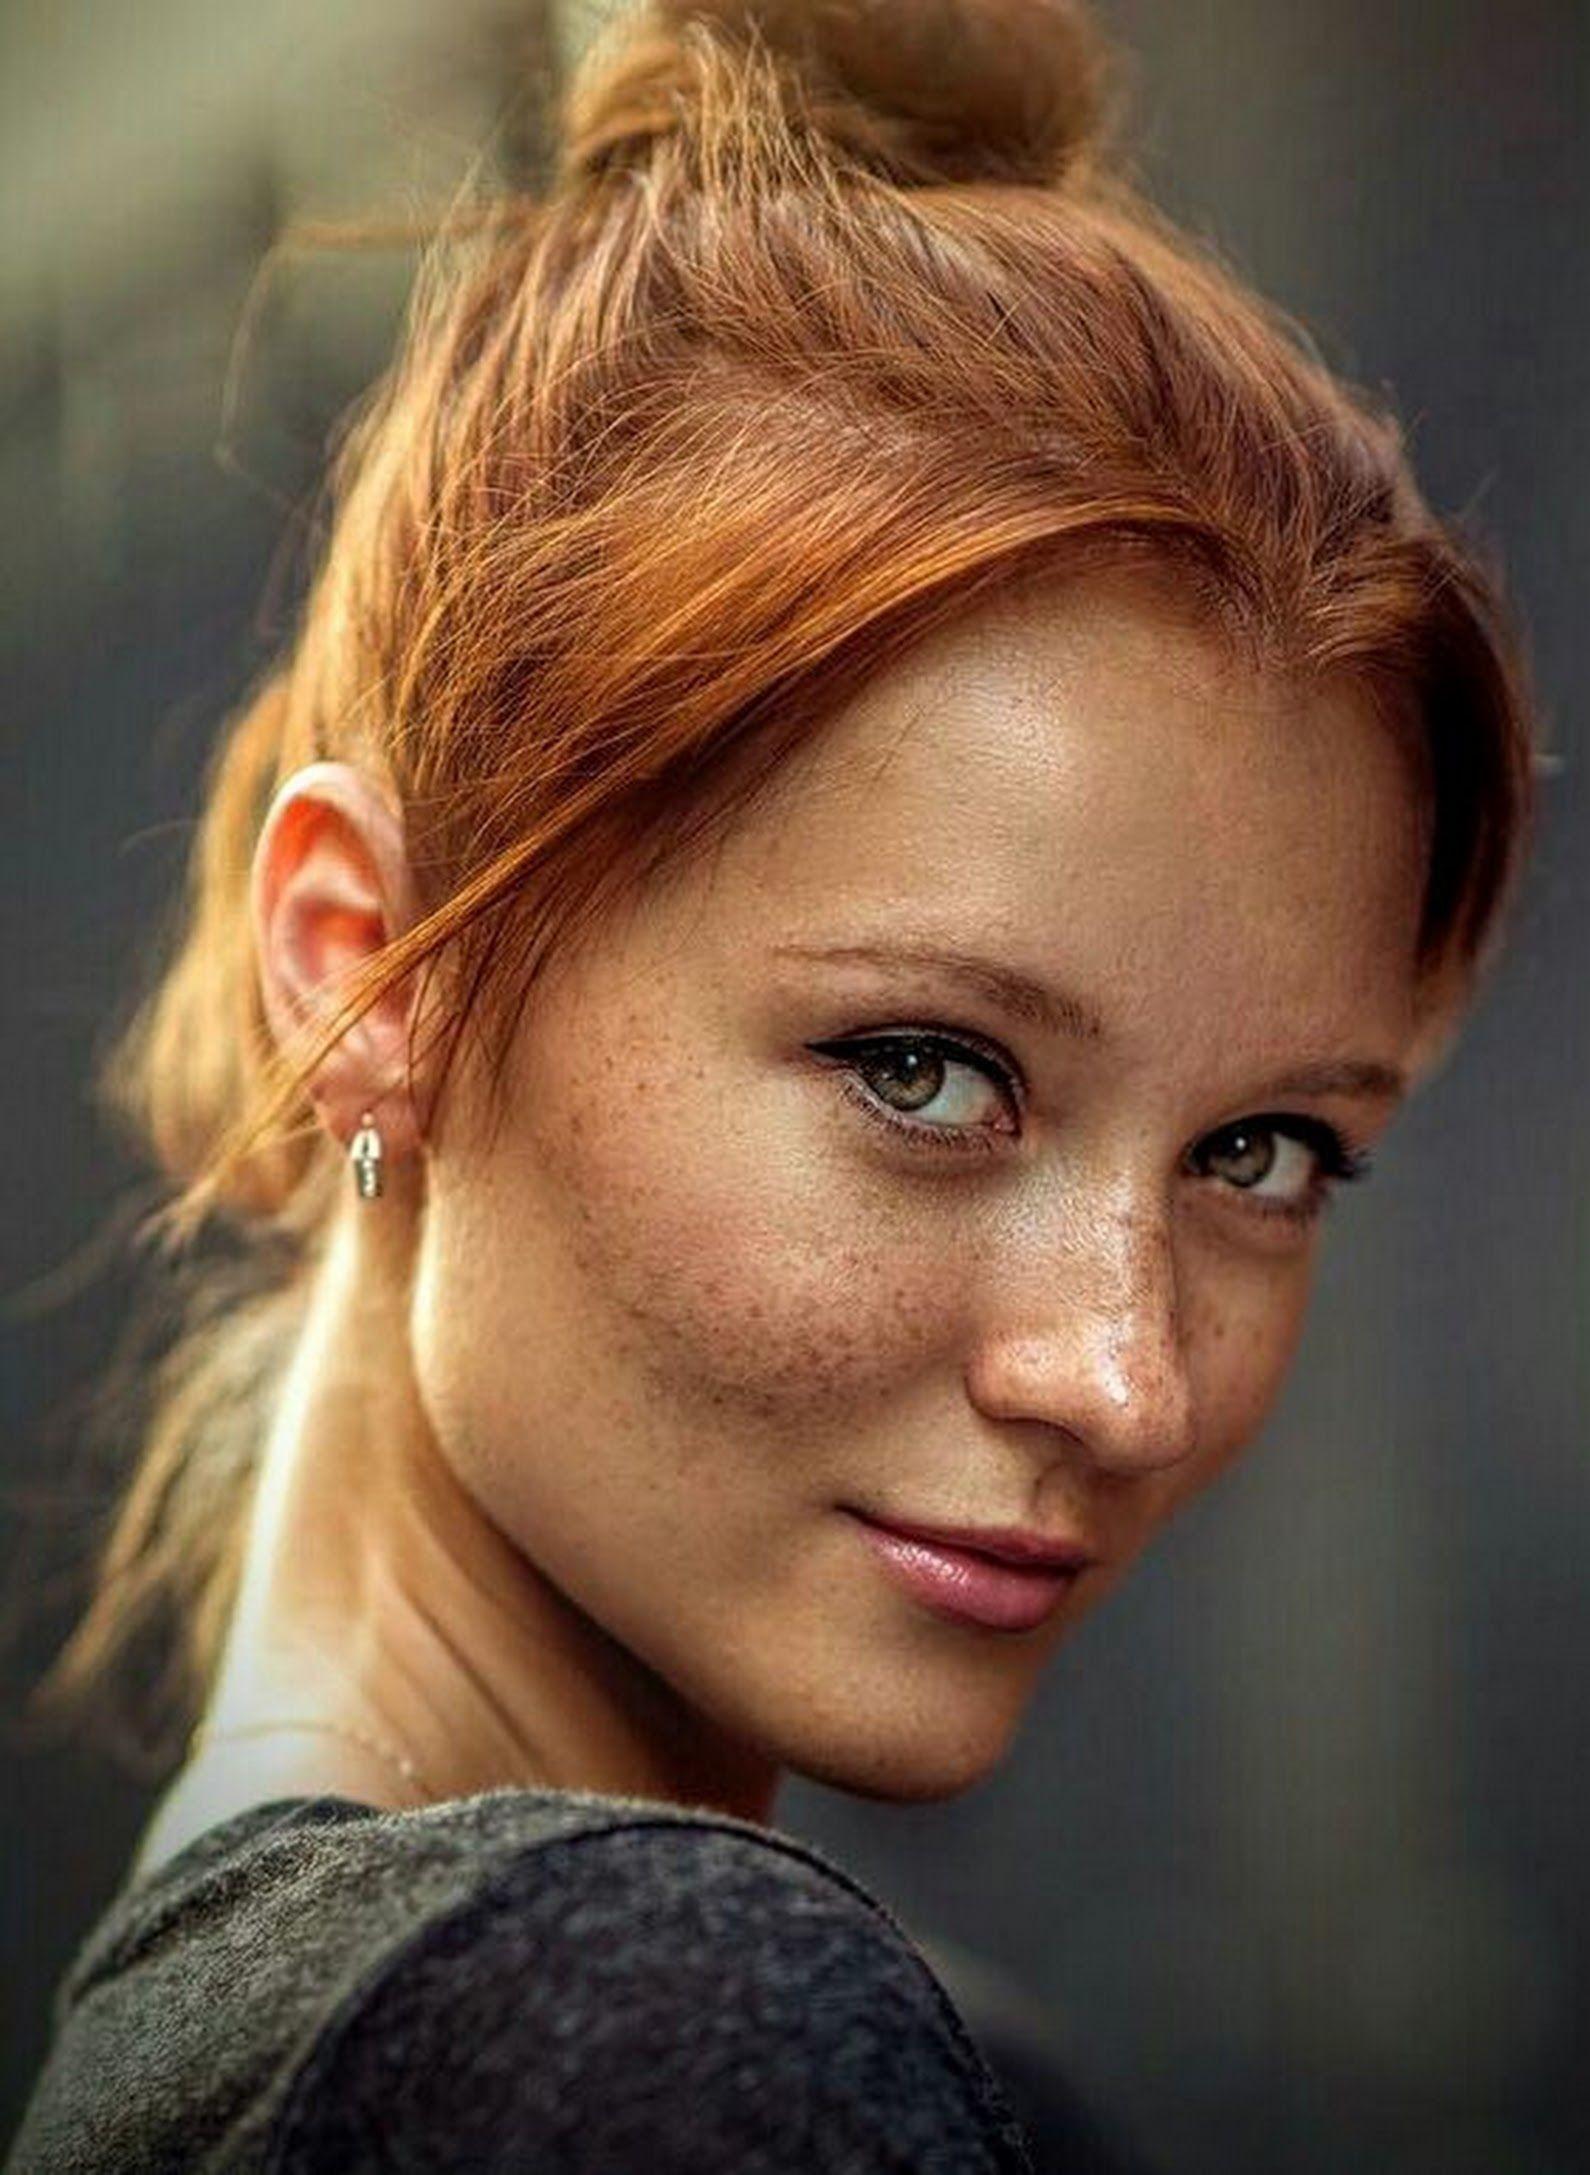 Res: 1590x2175, Natalya Rudakova (born February 15, 1985) is an Russian actress. |  Actresses | Pinterest | February 15, Actresses and Eye